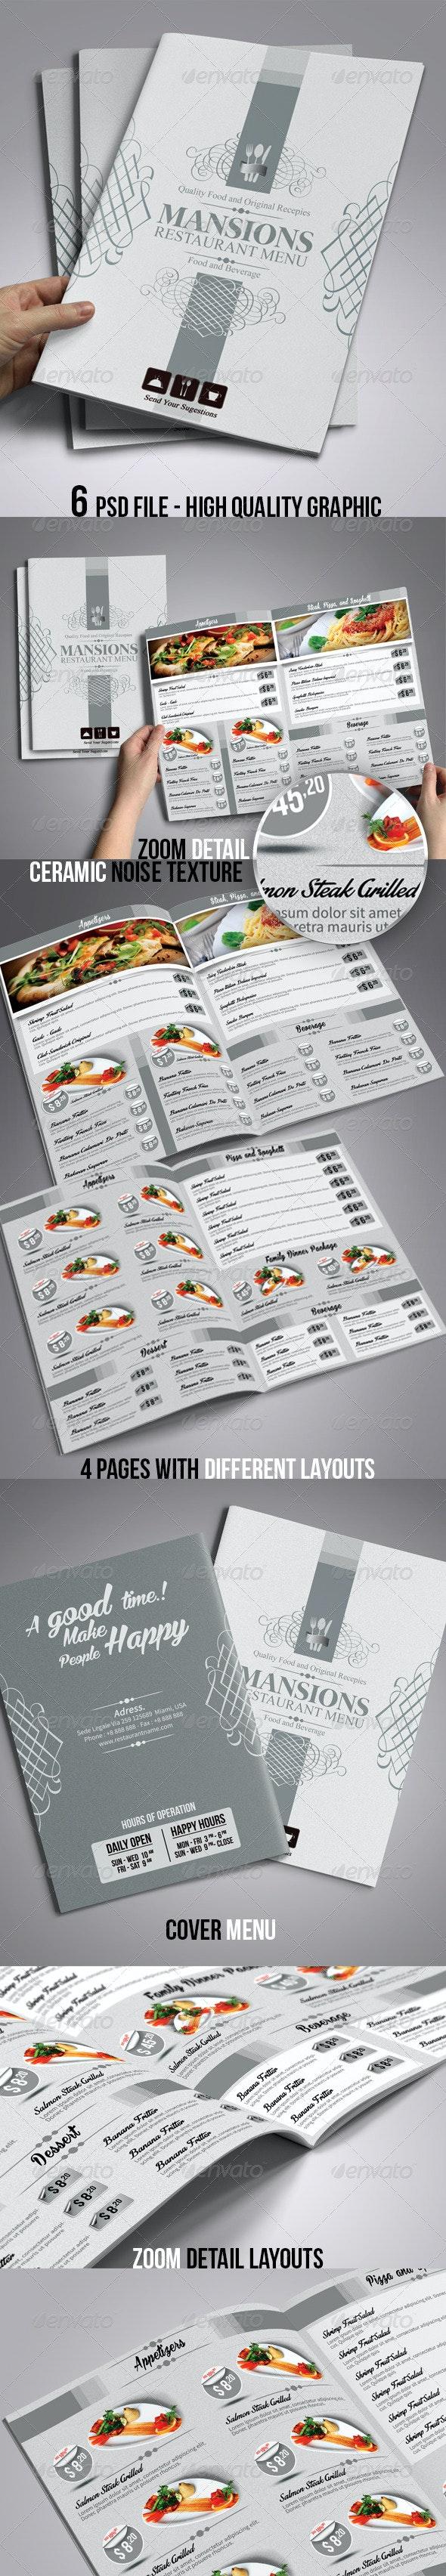 Restaurant Food & Beverage Menu Template - Food Menus Print Templates